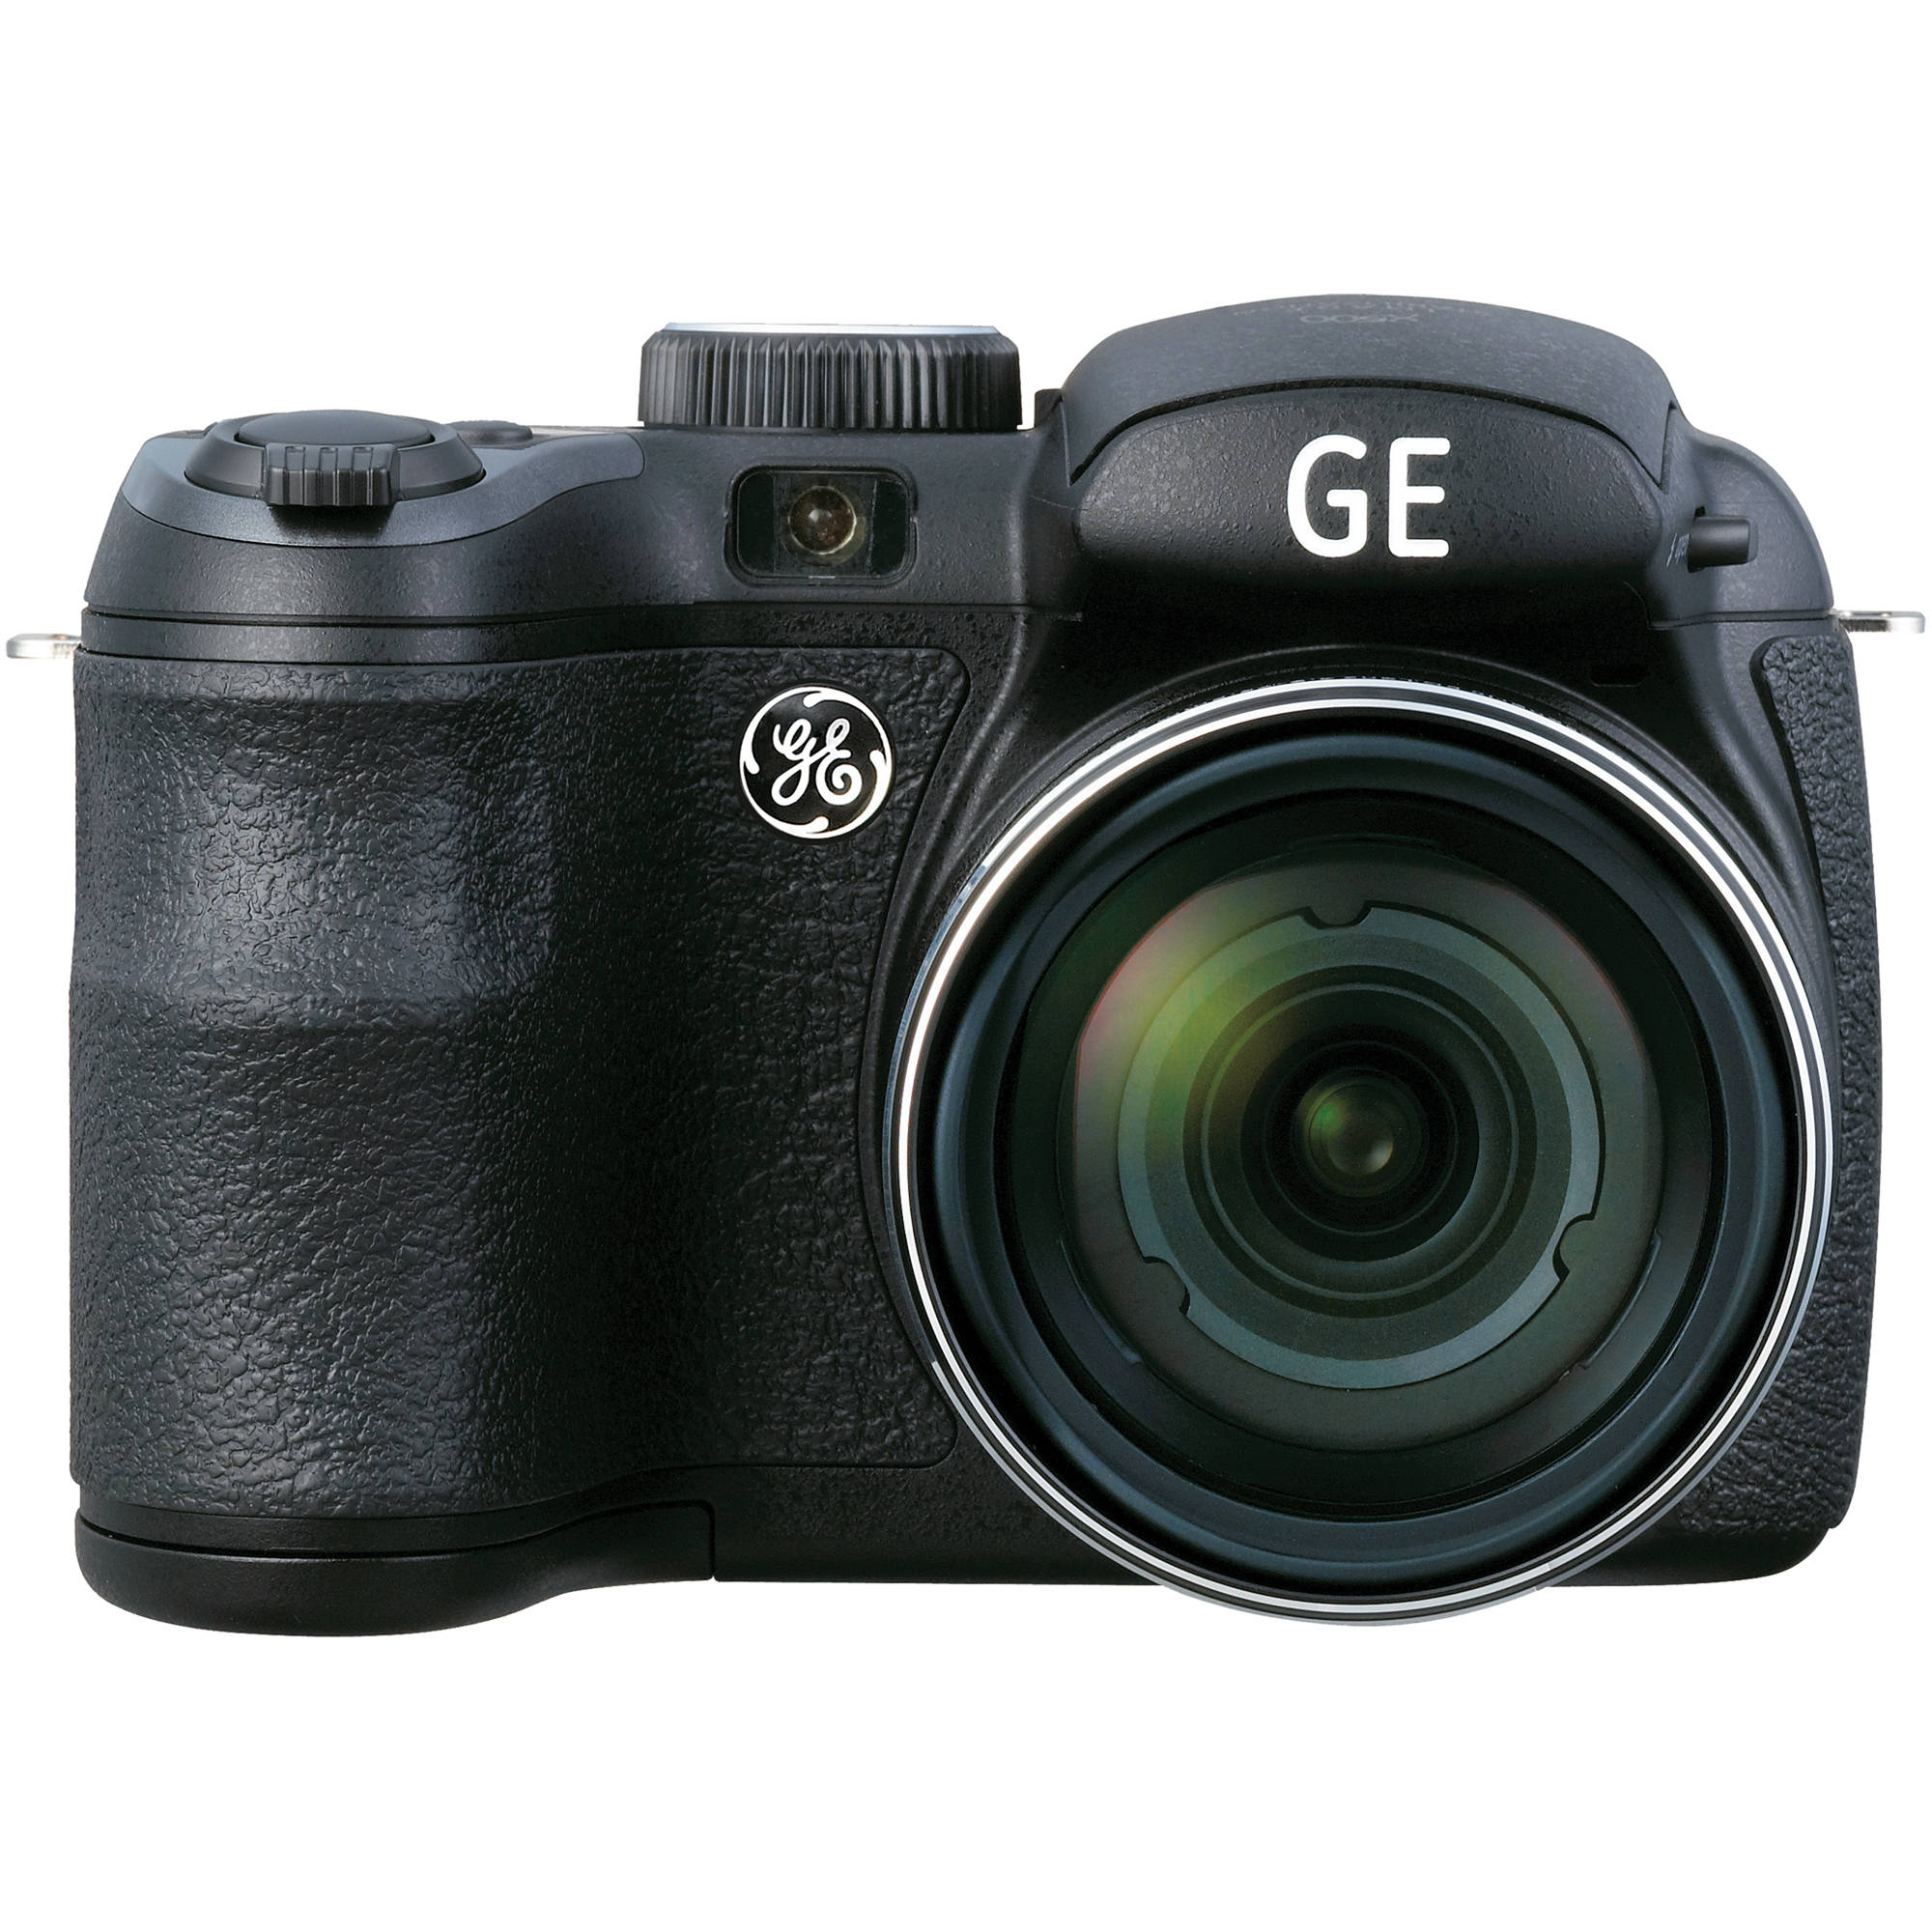 General Electric X500 Bridge Digital Camera (Black)